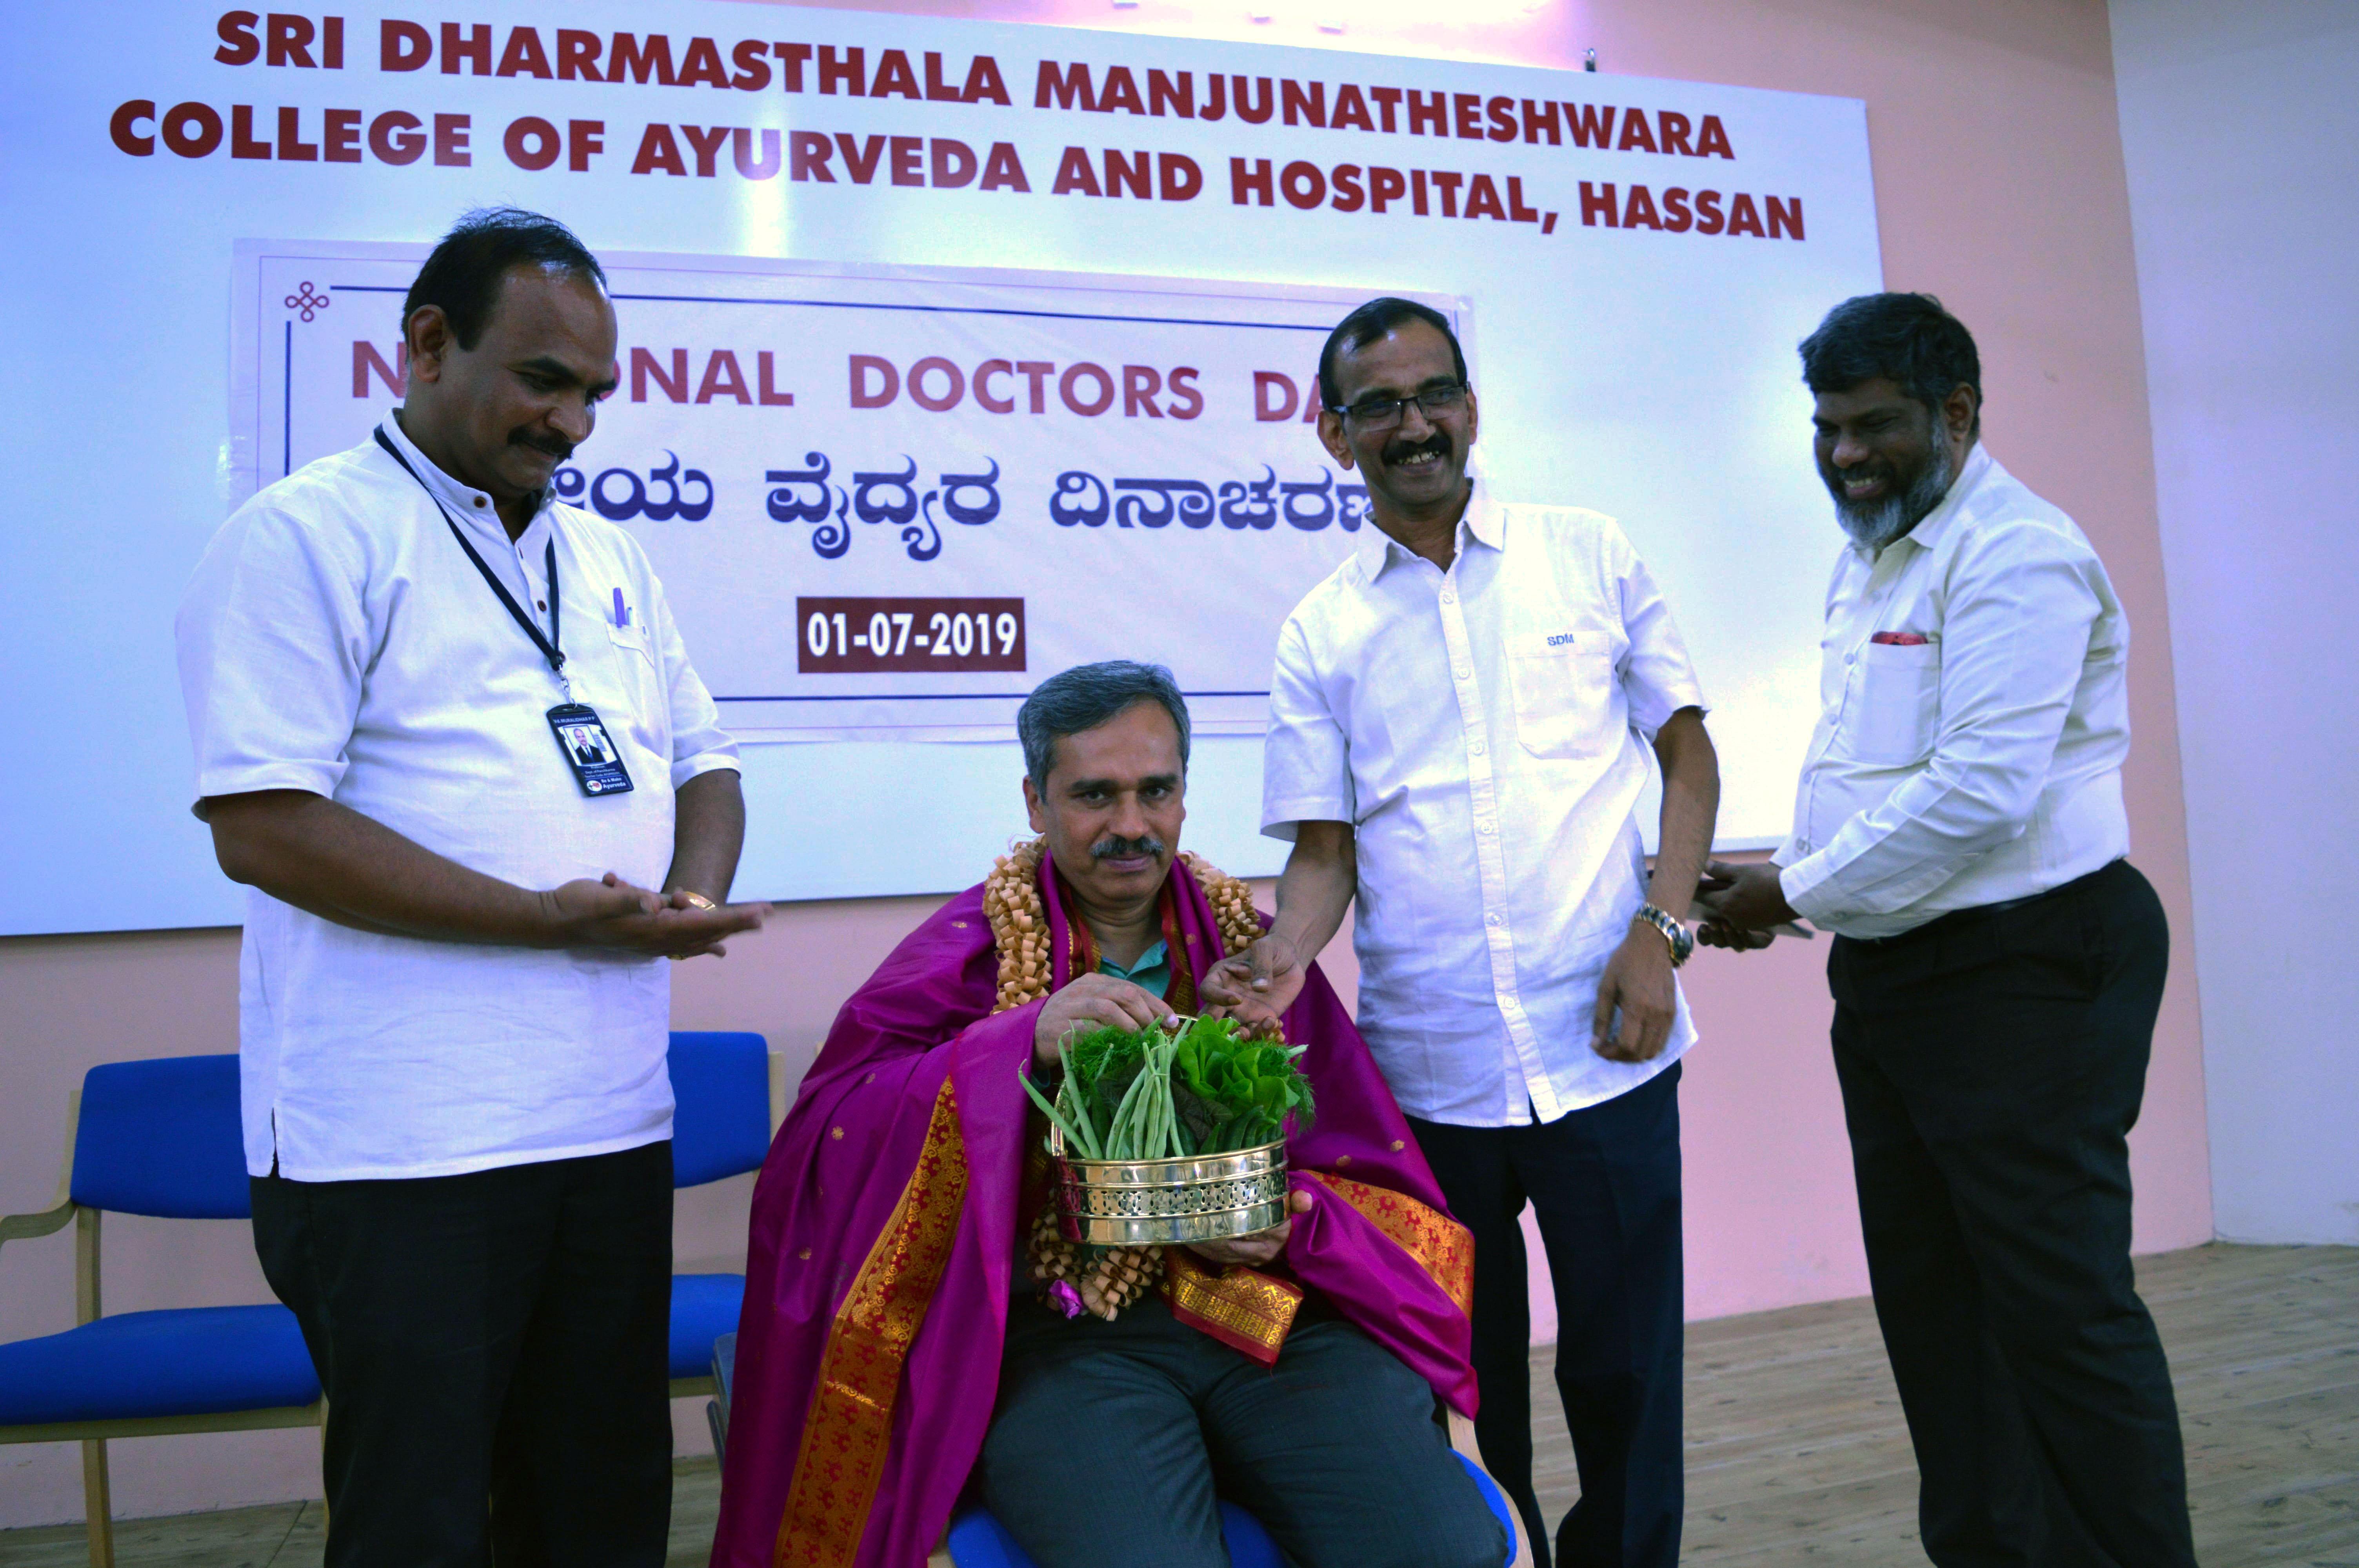 Felicitation to Dr. Krishnamurthy VR-min